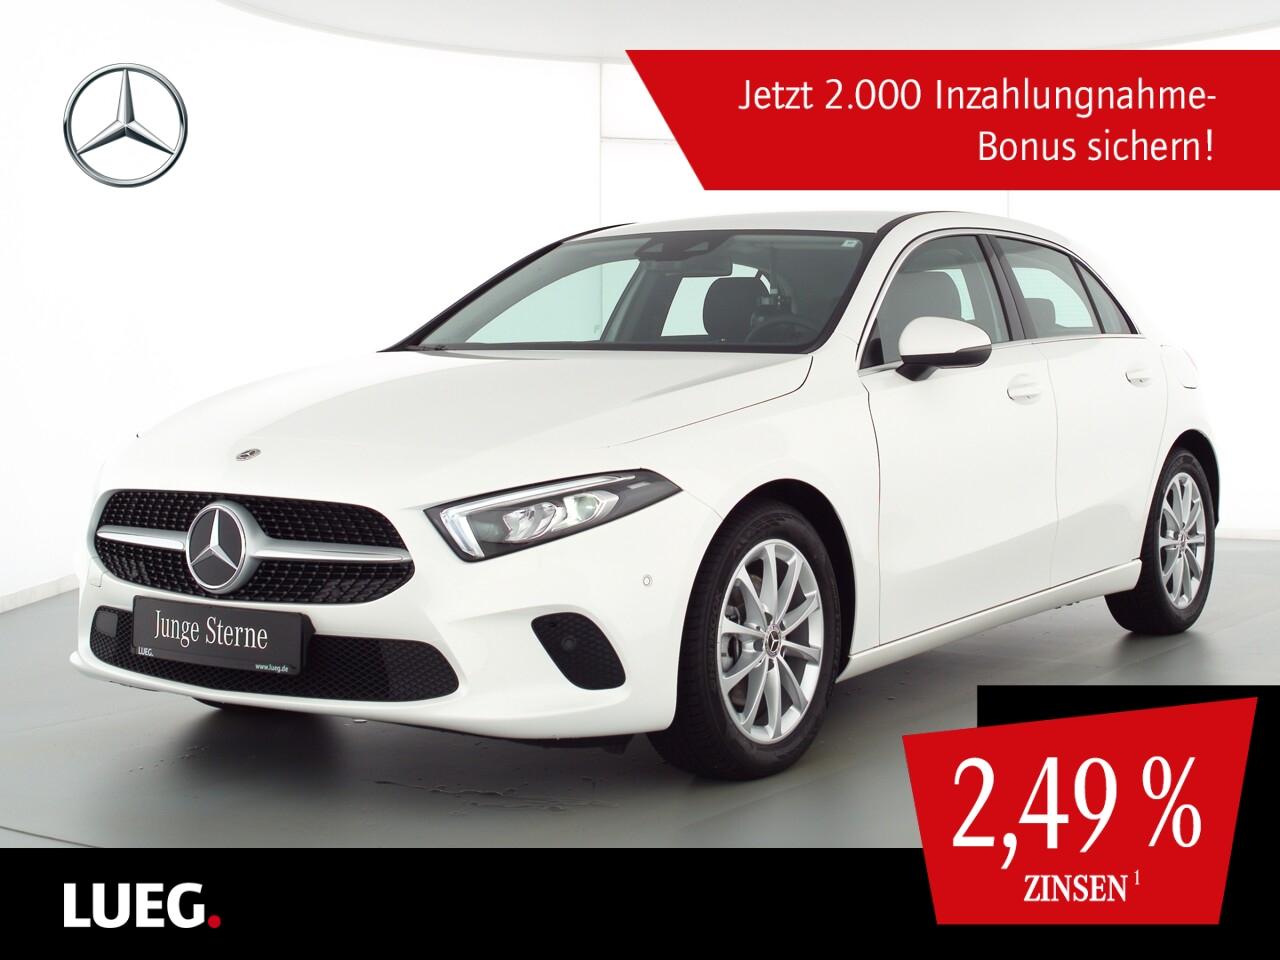 Mercedes-Benz A 180 d Progressive+MBUXHighEnd+LED-HP+TotwA+RFK, Jahr 2021, Diesel